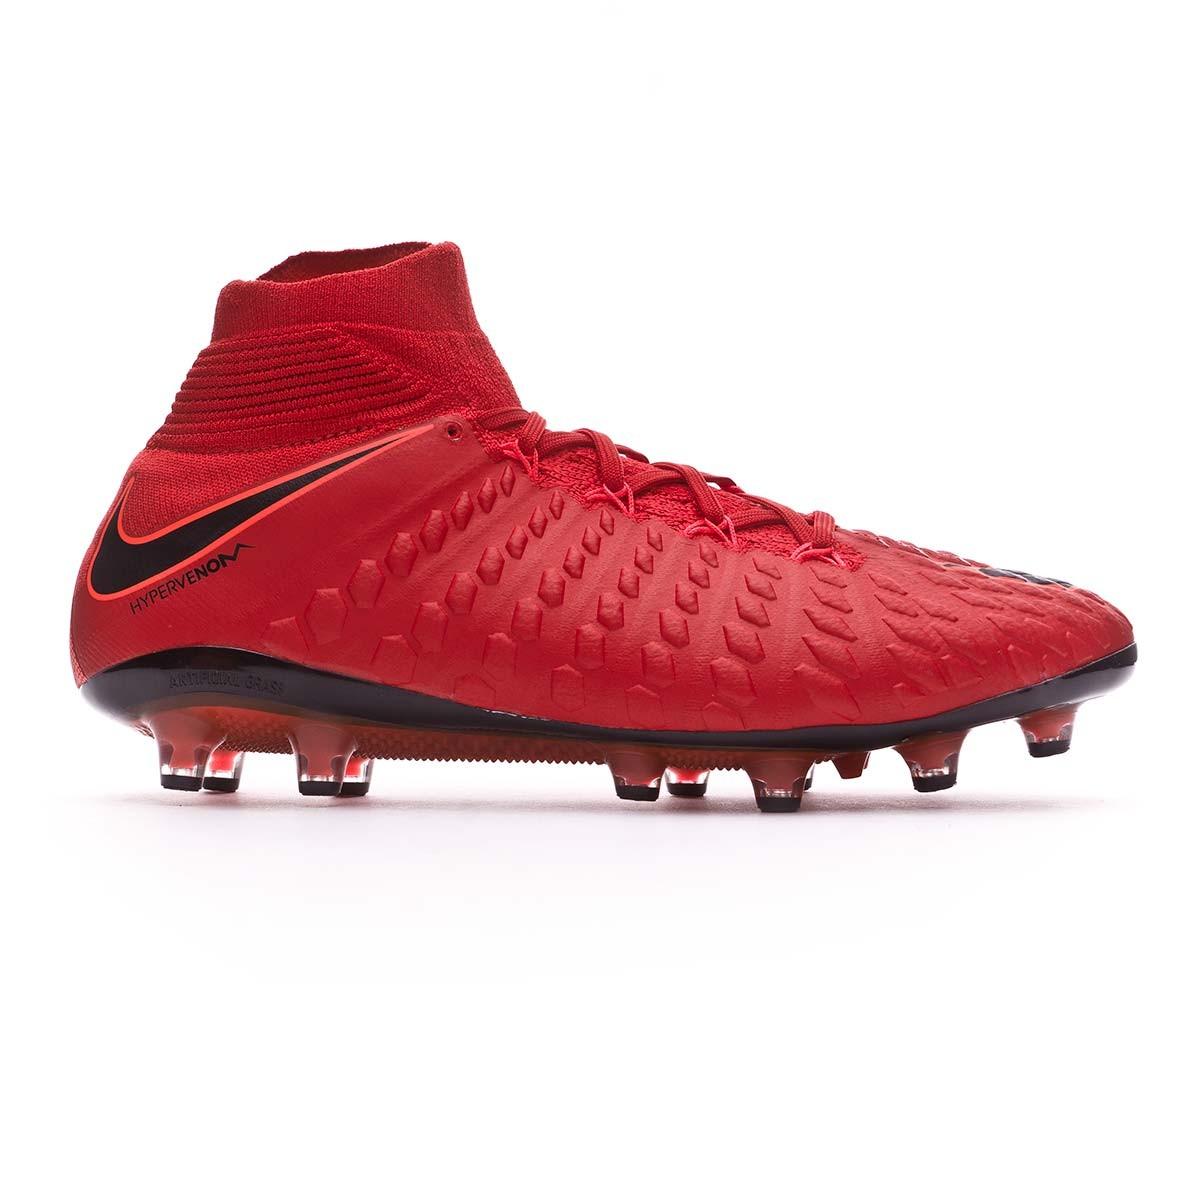 2130ea4e6 Football Boots Nike Hypervenom Phantom III DF ACC AG-Pro University red-Black-Bright  crimson - Football store Fútbol Emotion